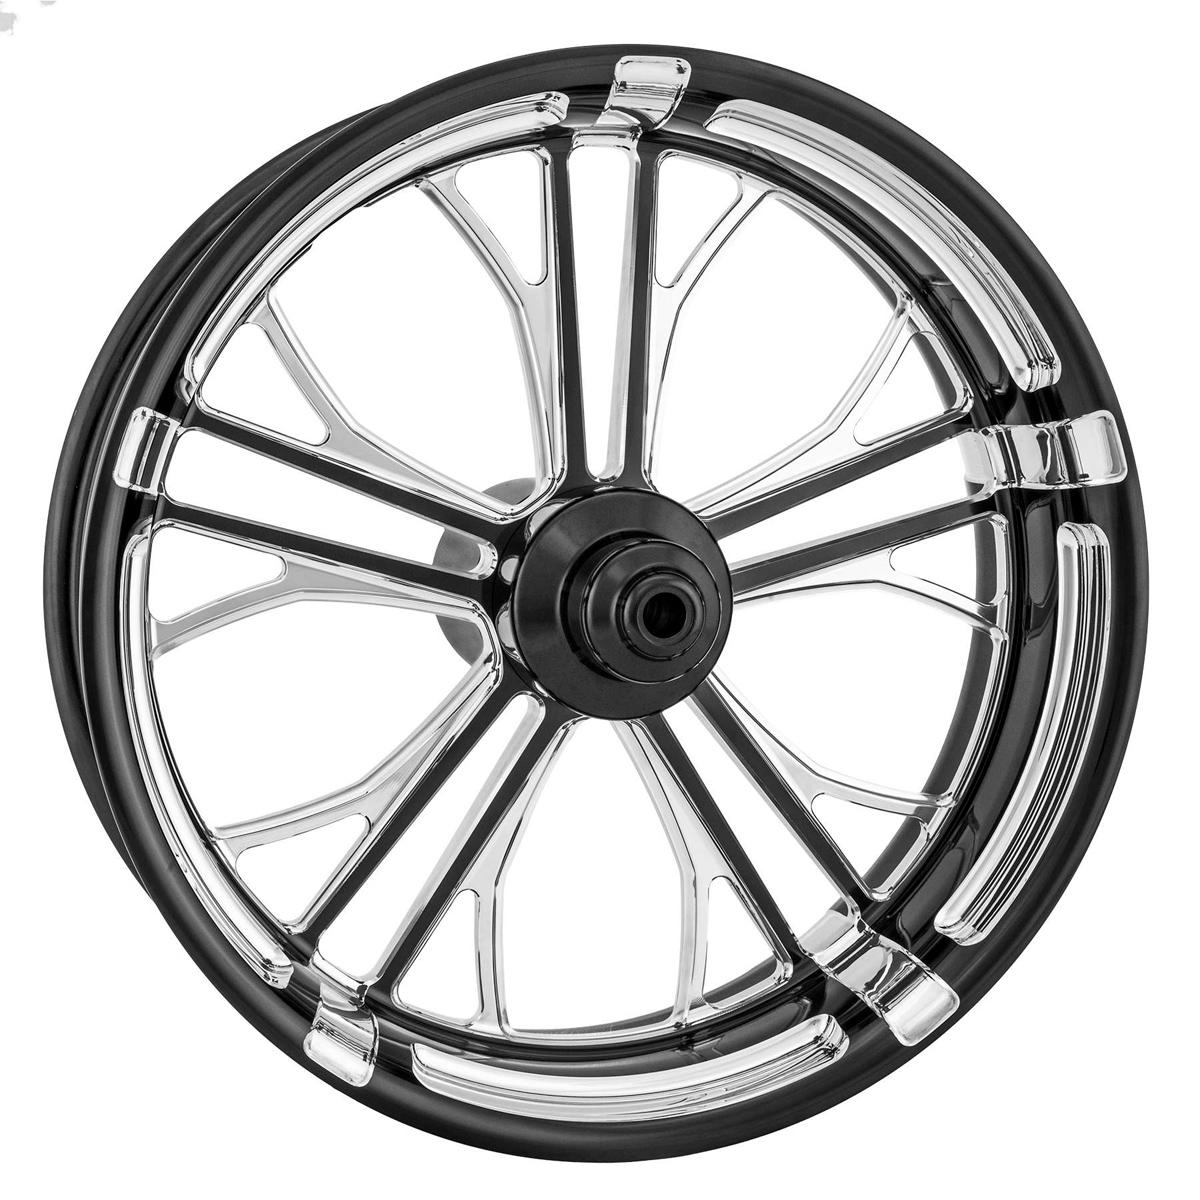 Performance Machine Dixon Platinum Cut Rear Wheel 18x3.5 ABS